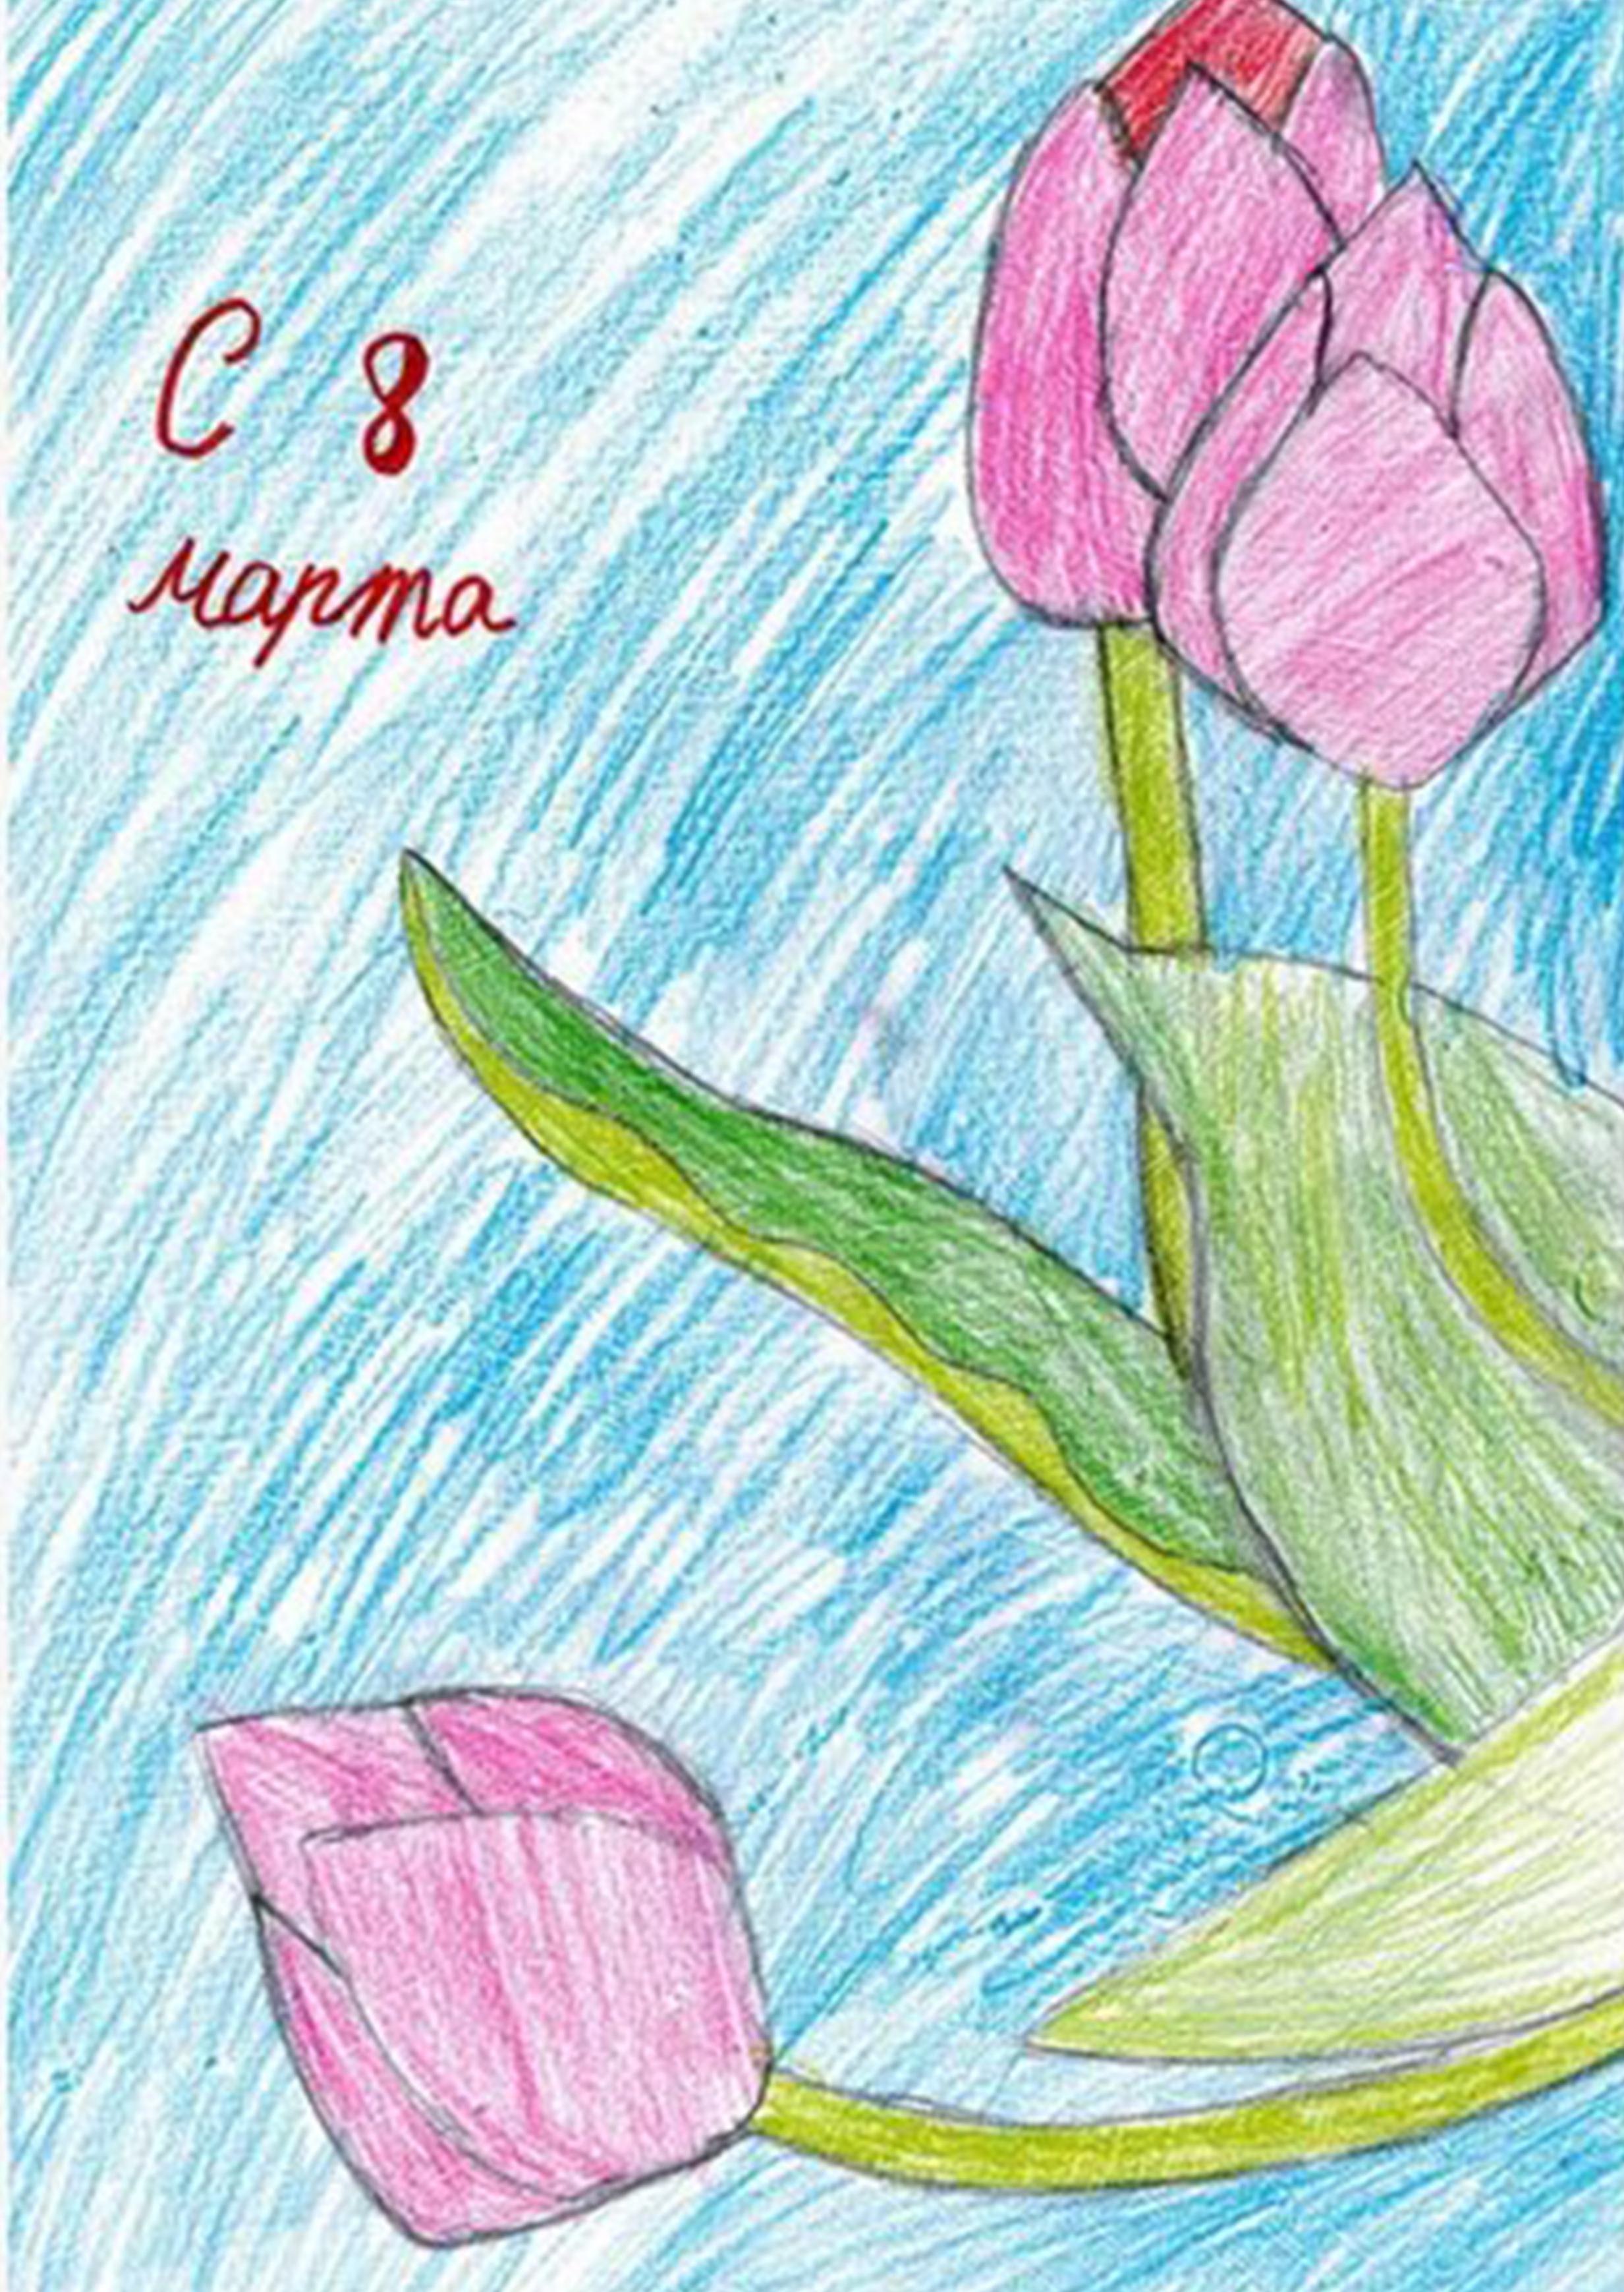 Картинка подарок маме на 8 марта рисунок